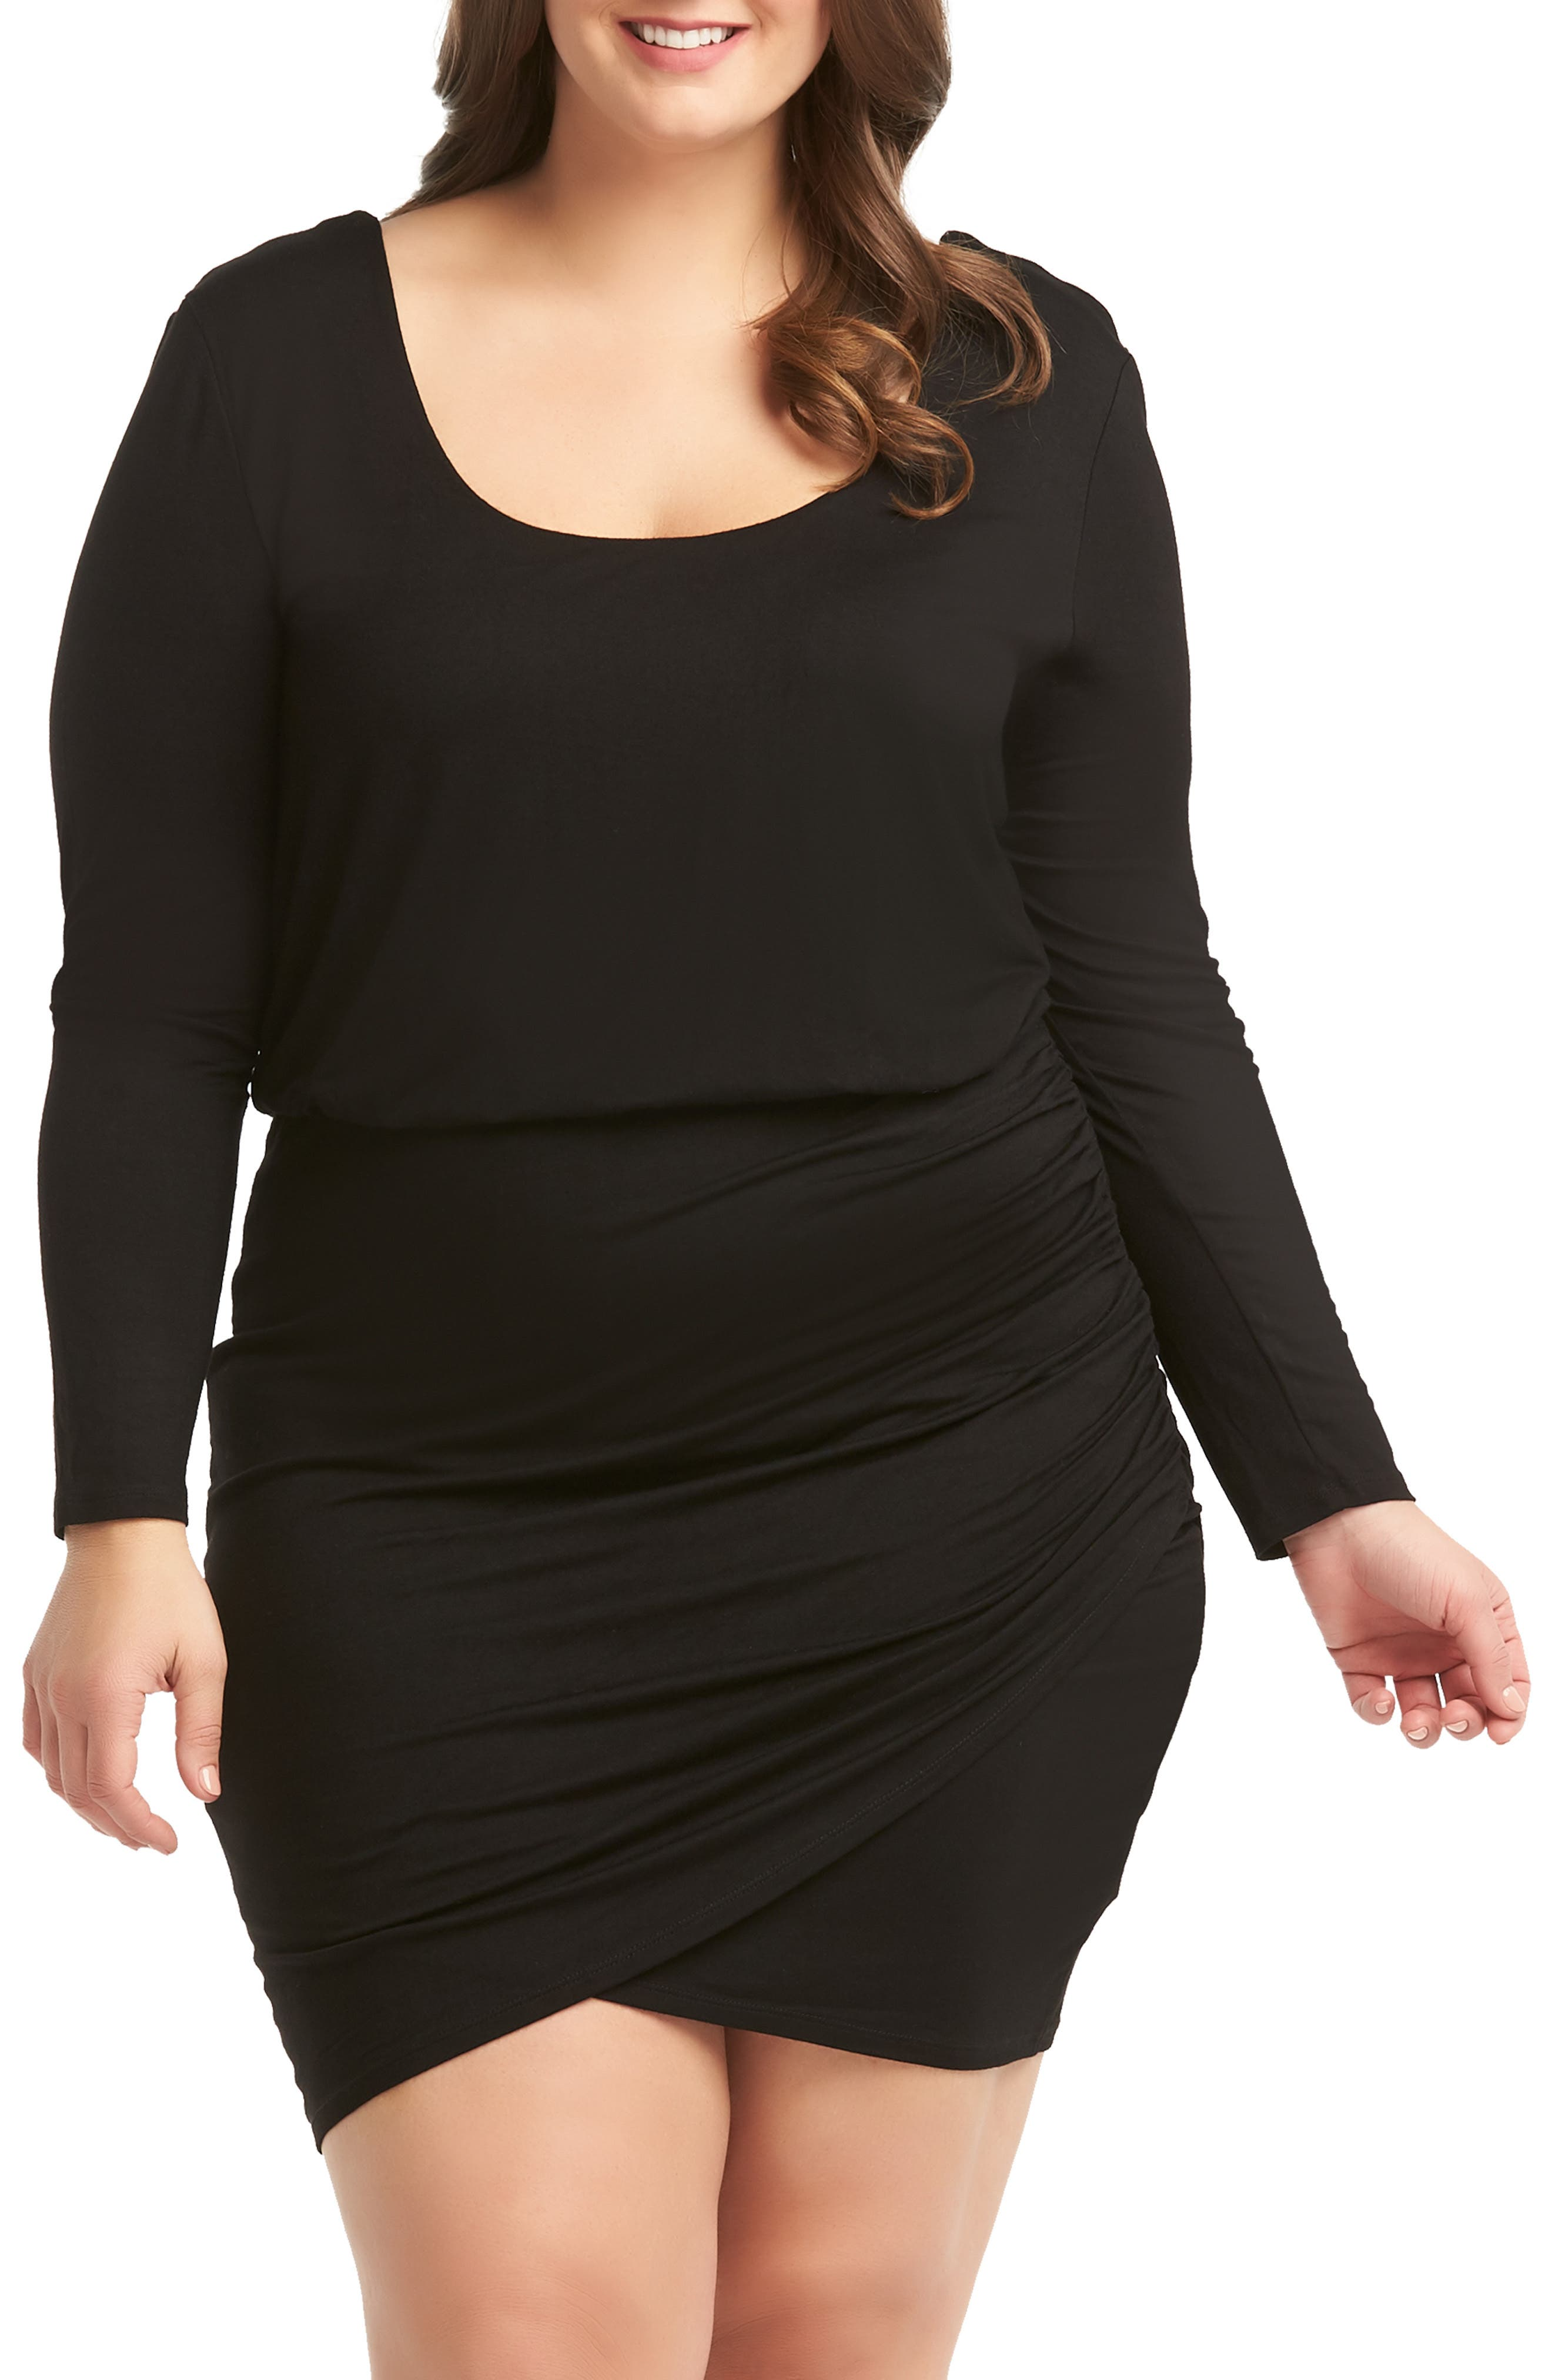 Plus Size Lemon Tart Dennis Ruched Wrap Look Dress, Black